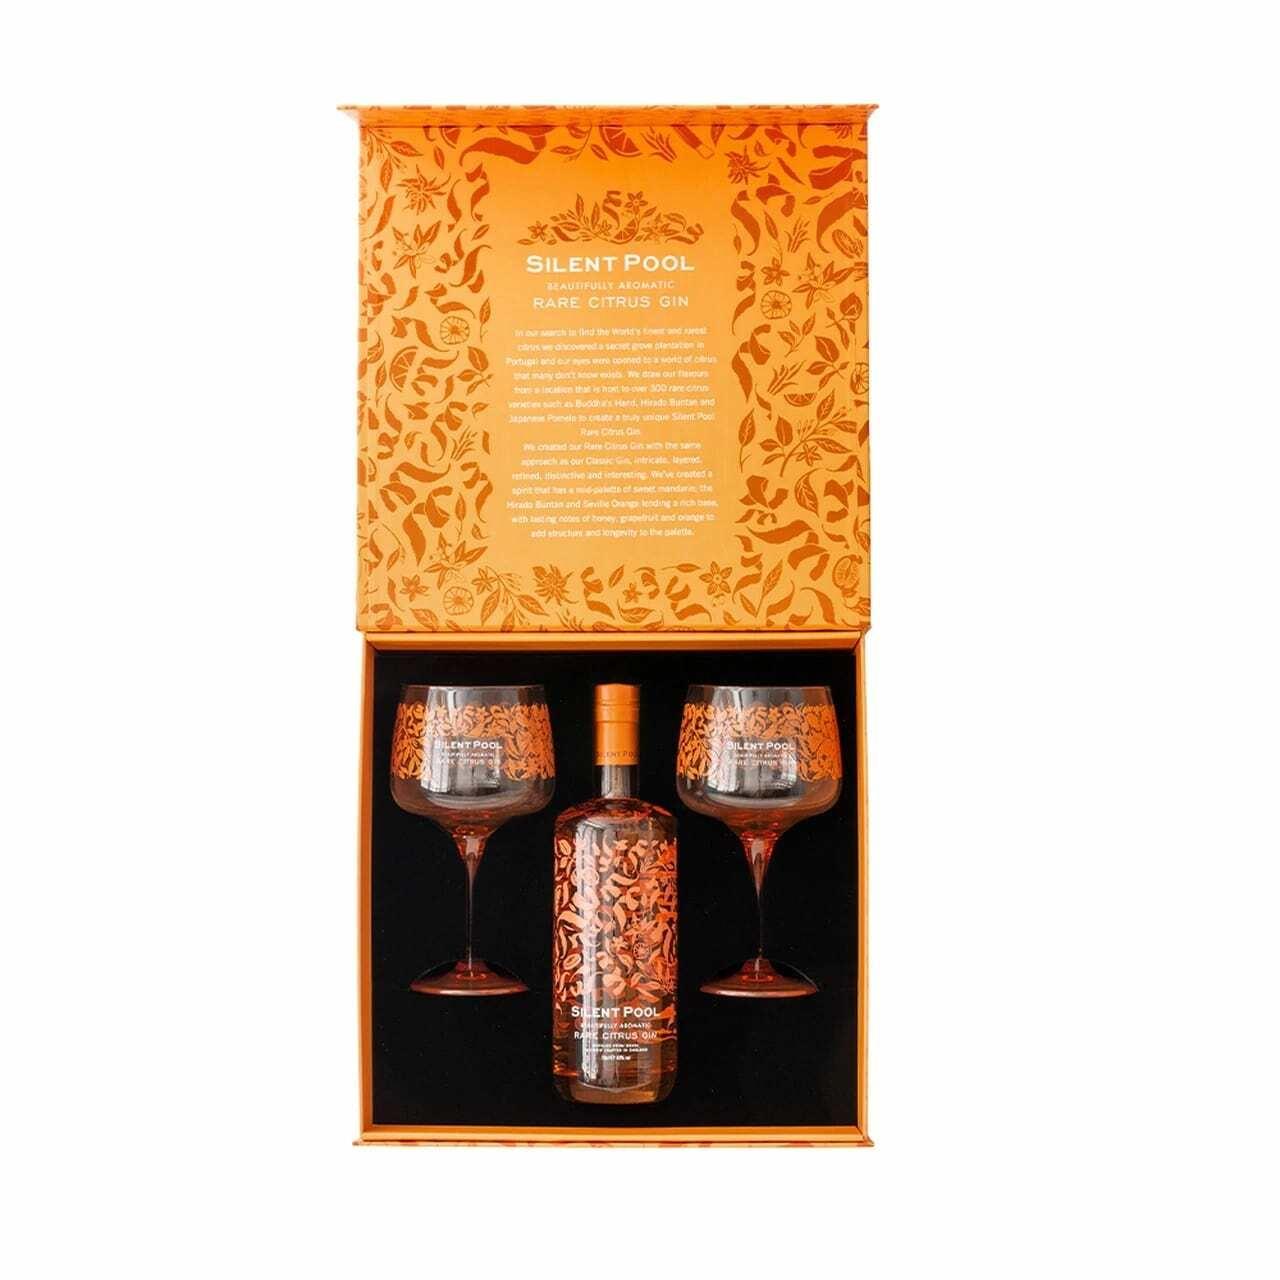 Silent Pool Rare Citrus Gin and Copa Gift Box